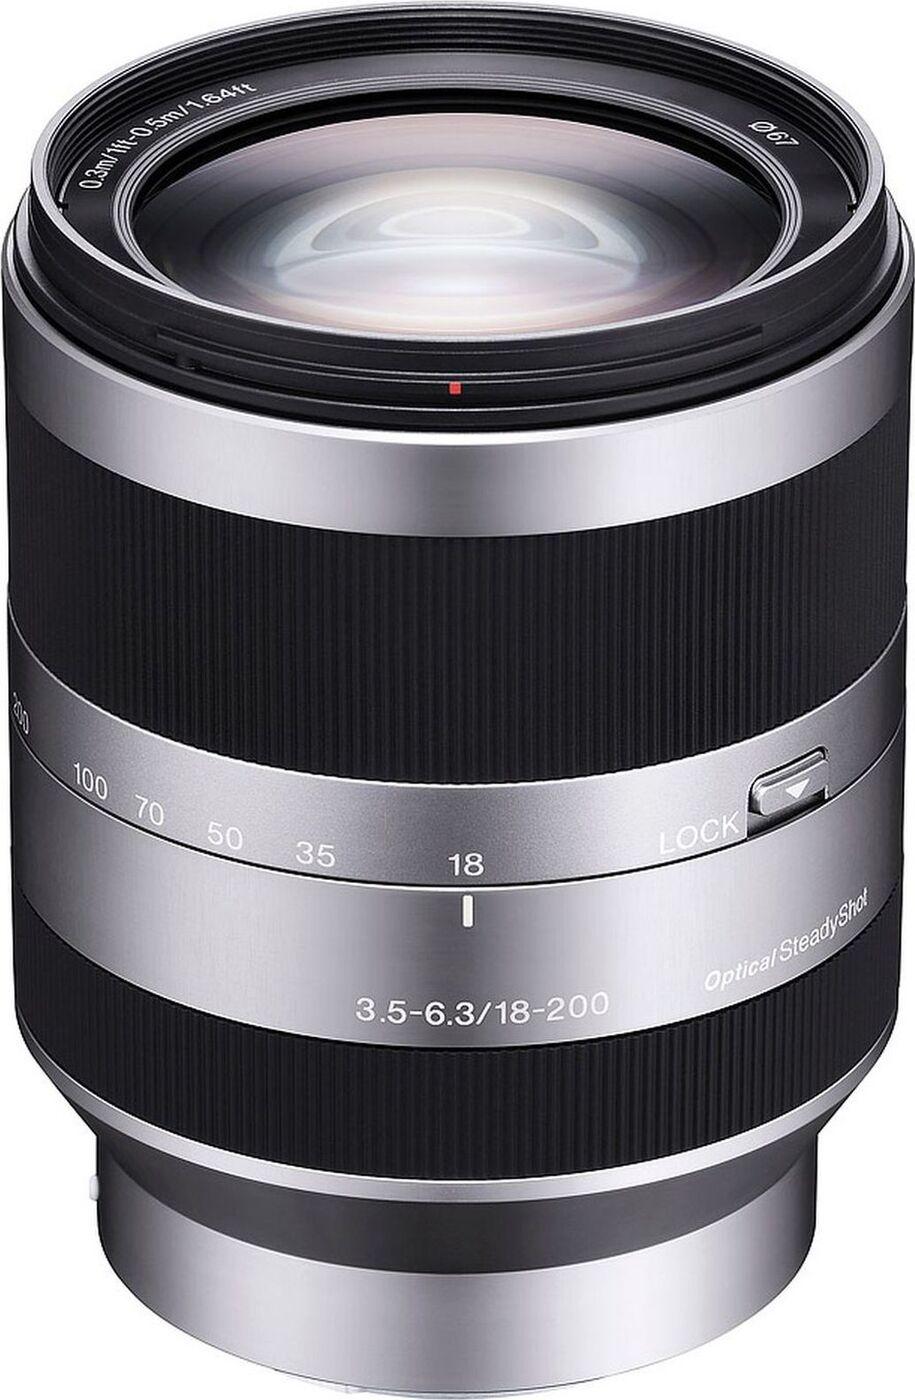 Объектив Sony E 18-200mm F3.5-6.3 OSS, черный, серебристый